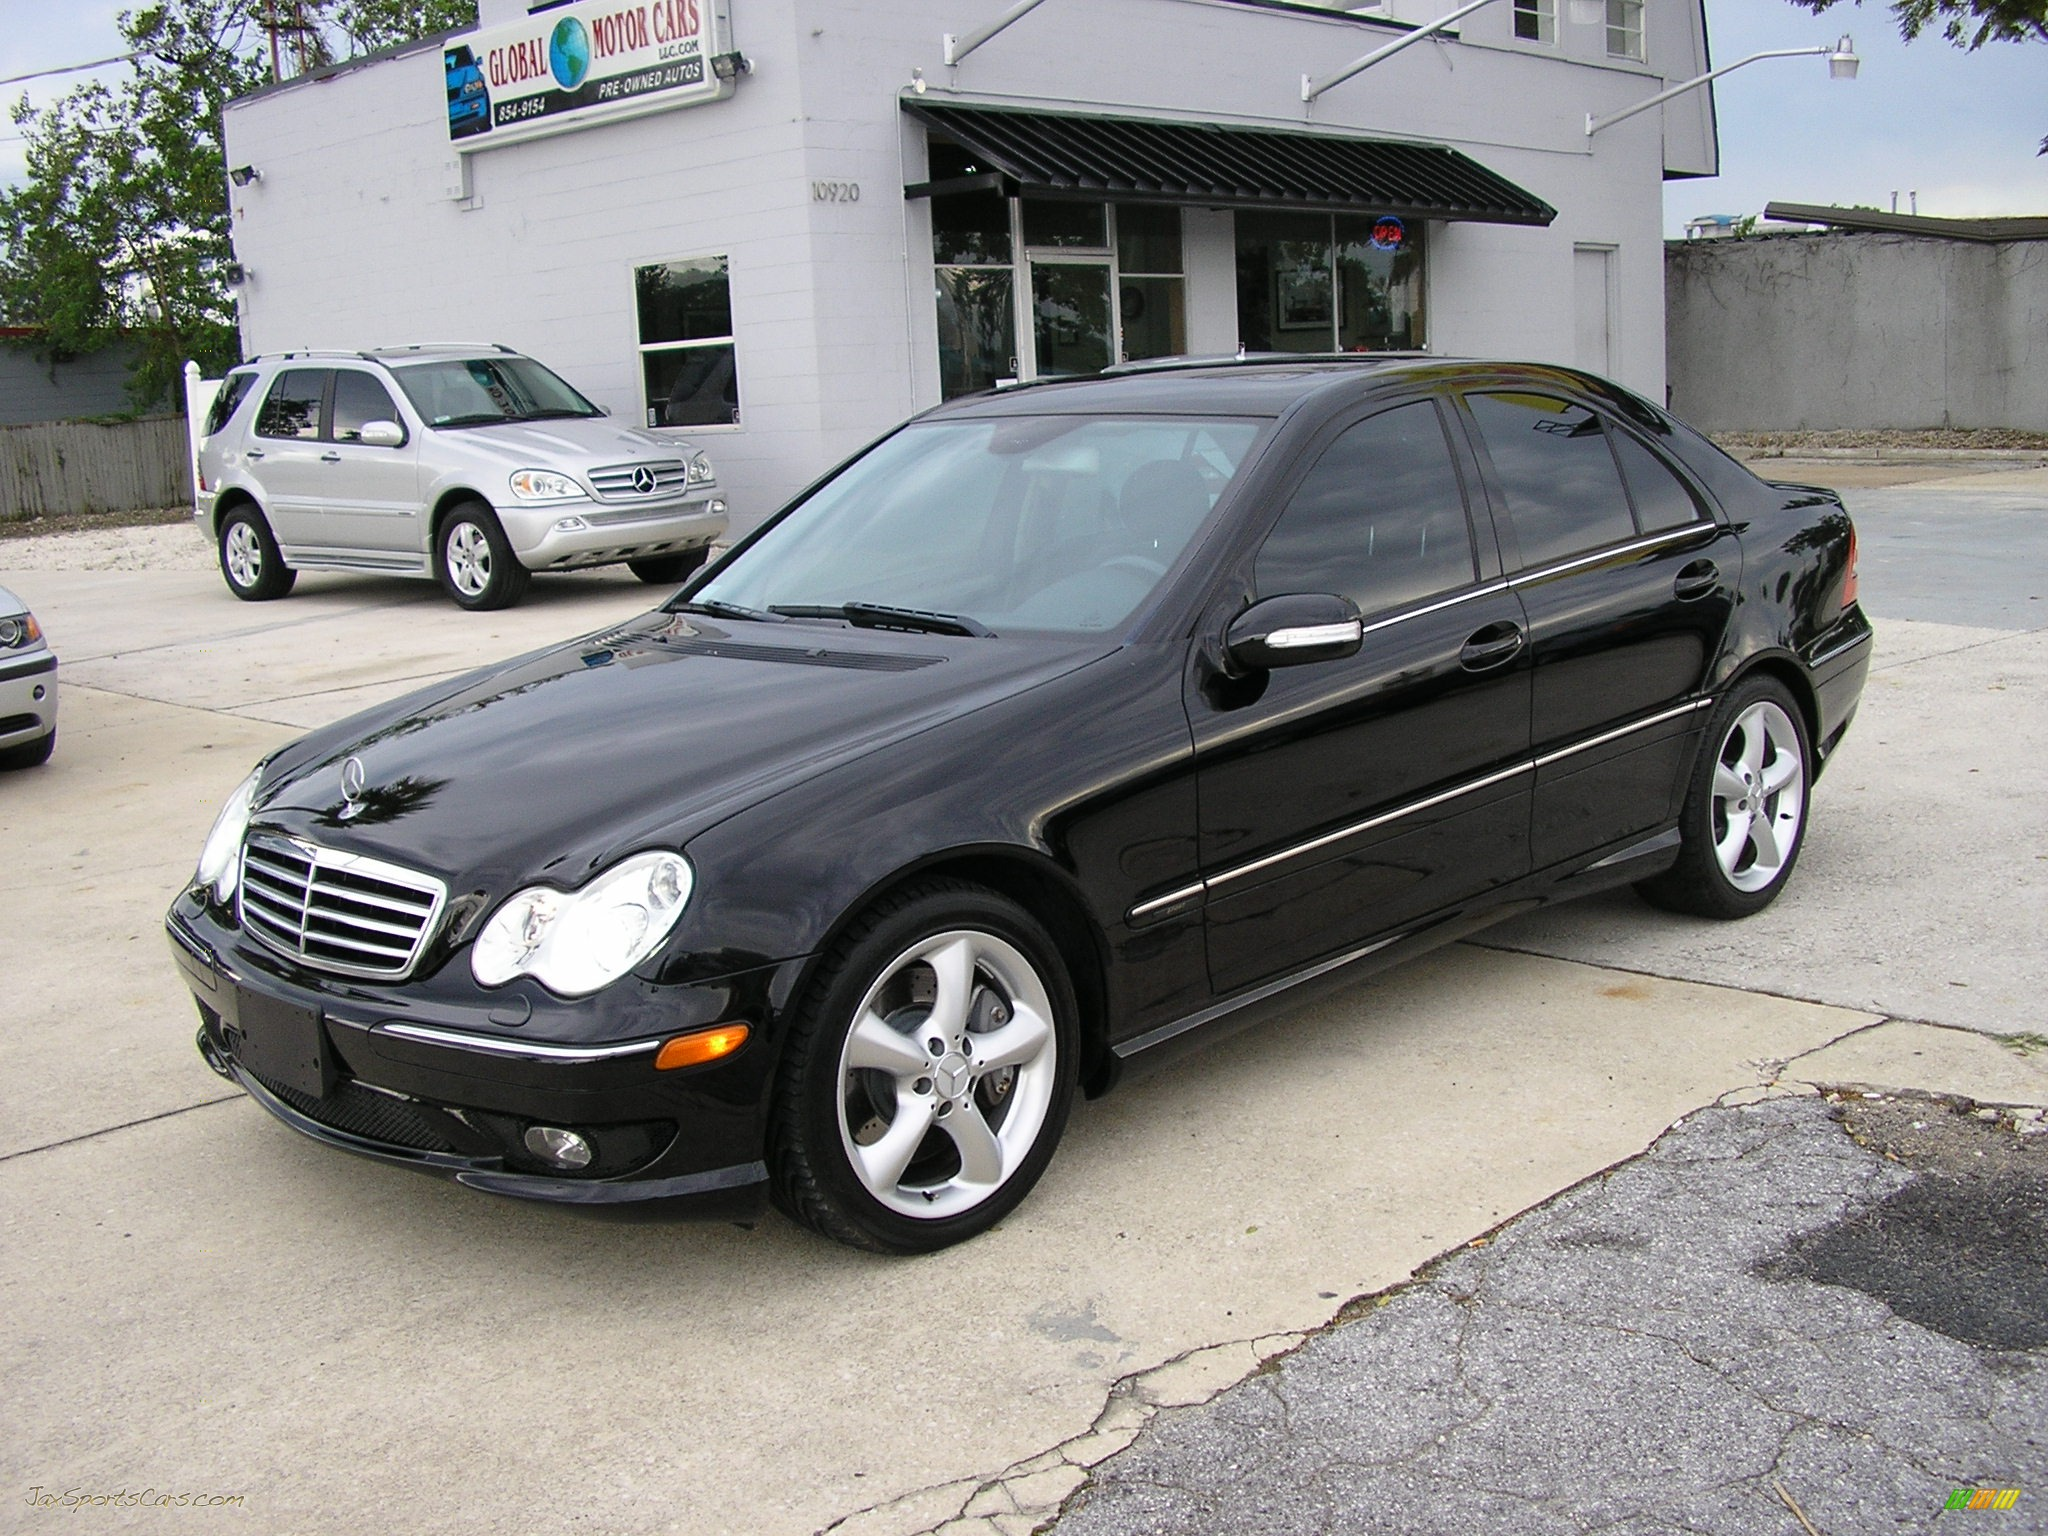 2005 mercedes benz c 230 kompressor sedan in black photo for Mercedes benz atlantic blvd